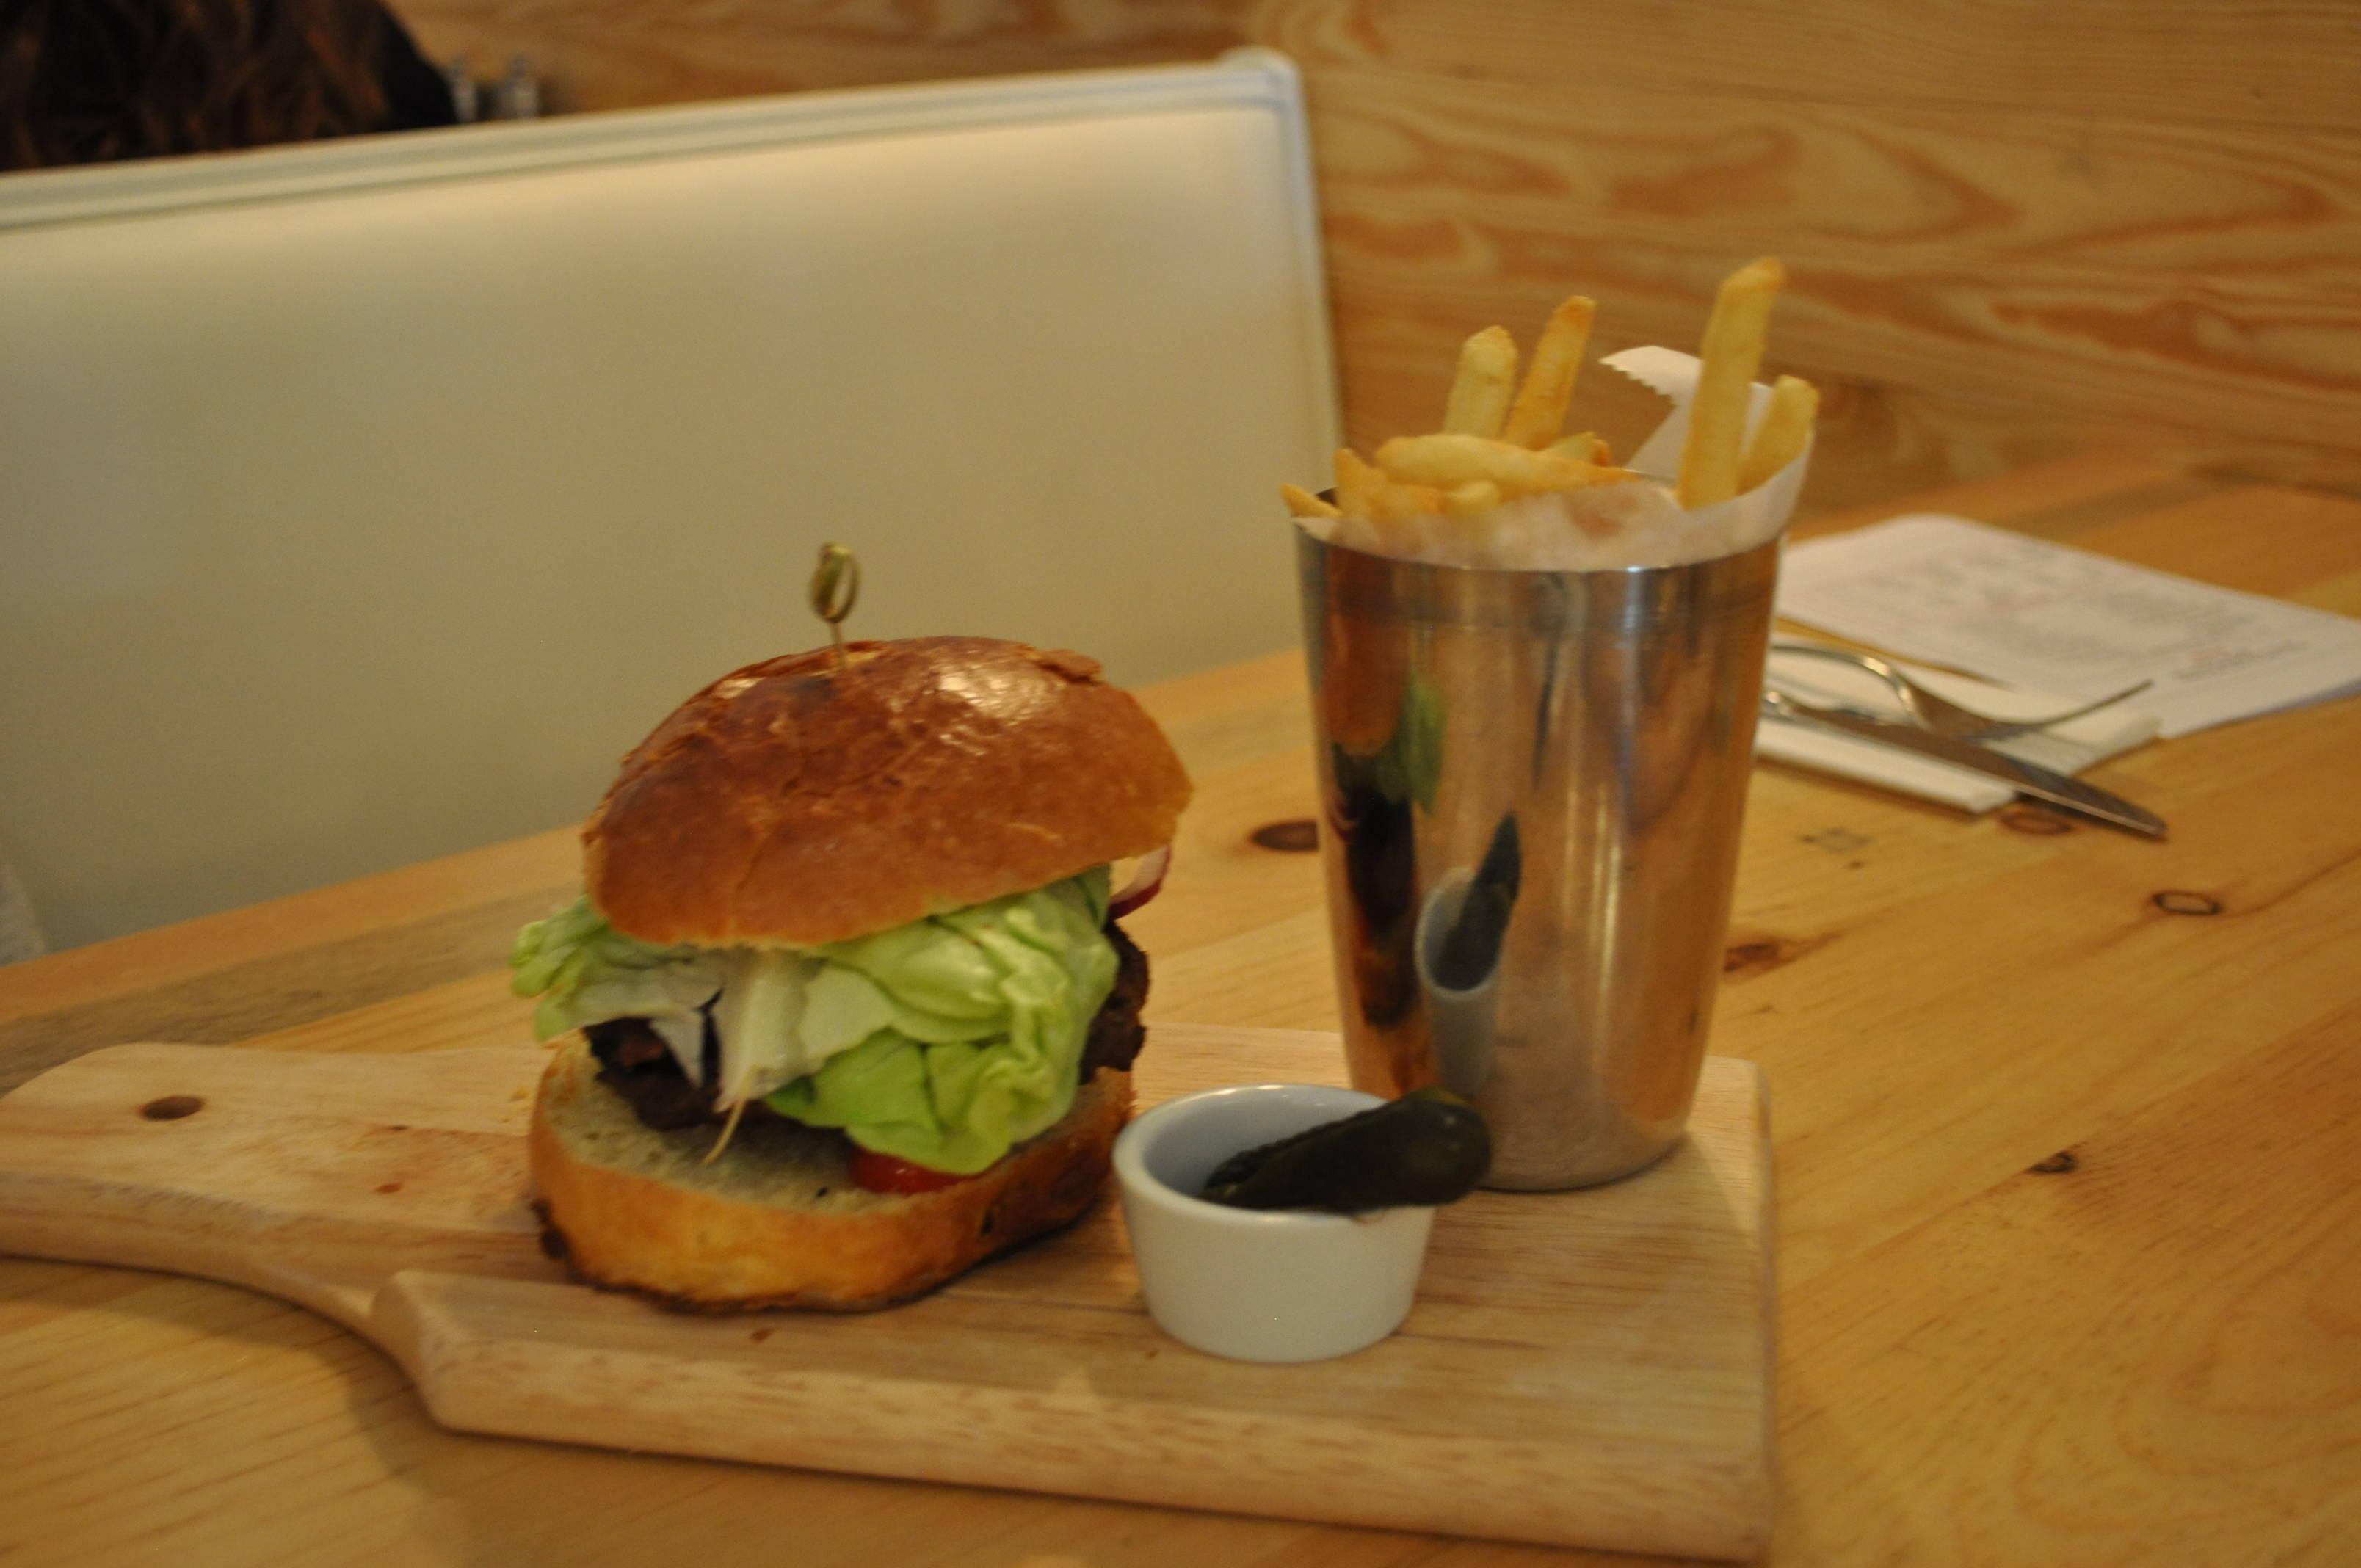 ddc4e89d592a7d5bbd7e_c7ace02af8b8b14d573f_burger.JPG